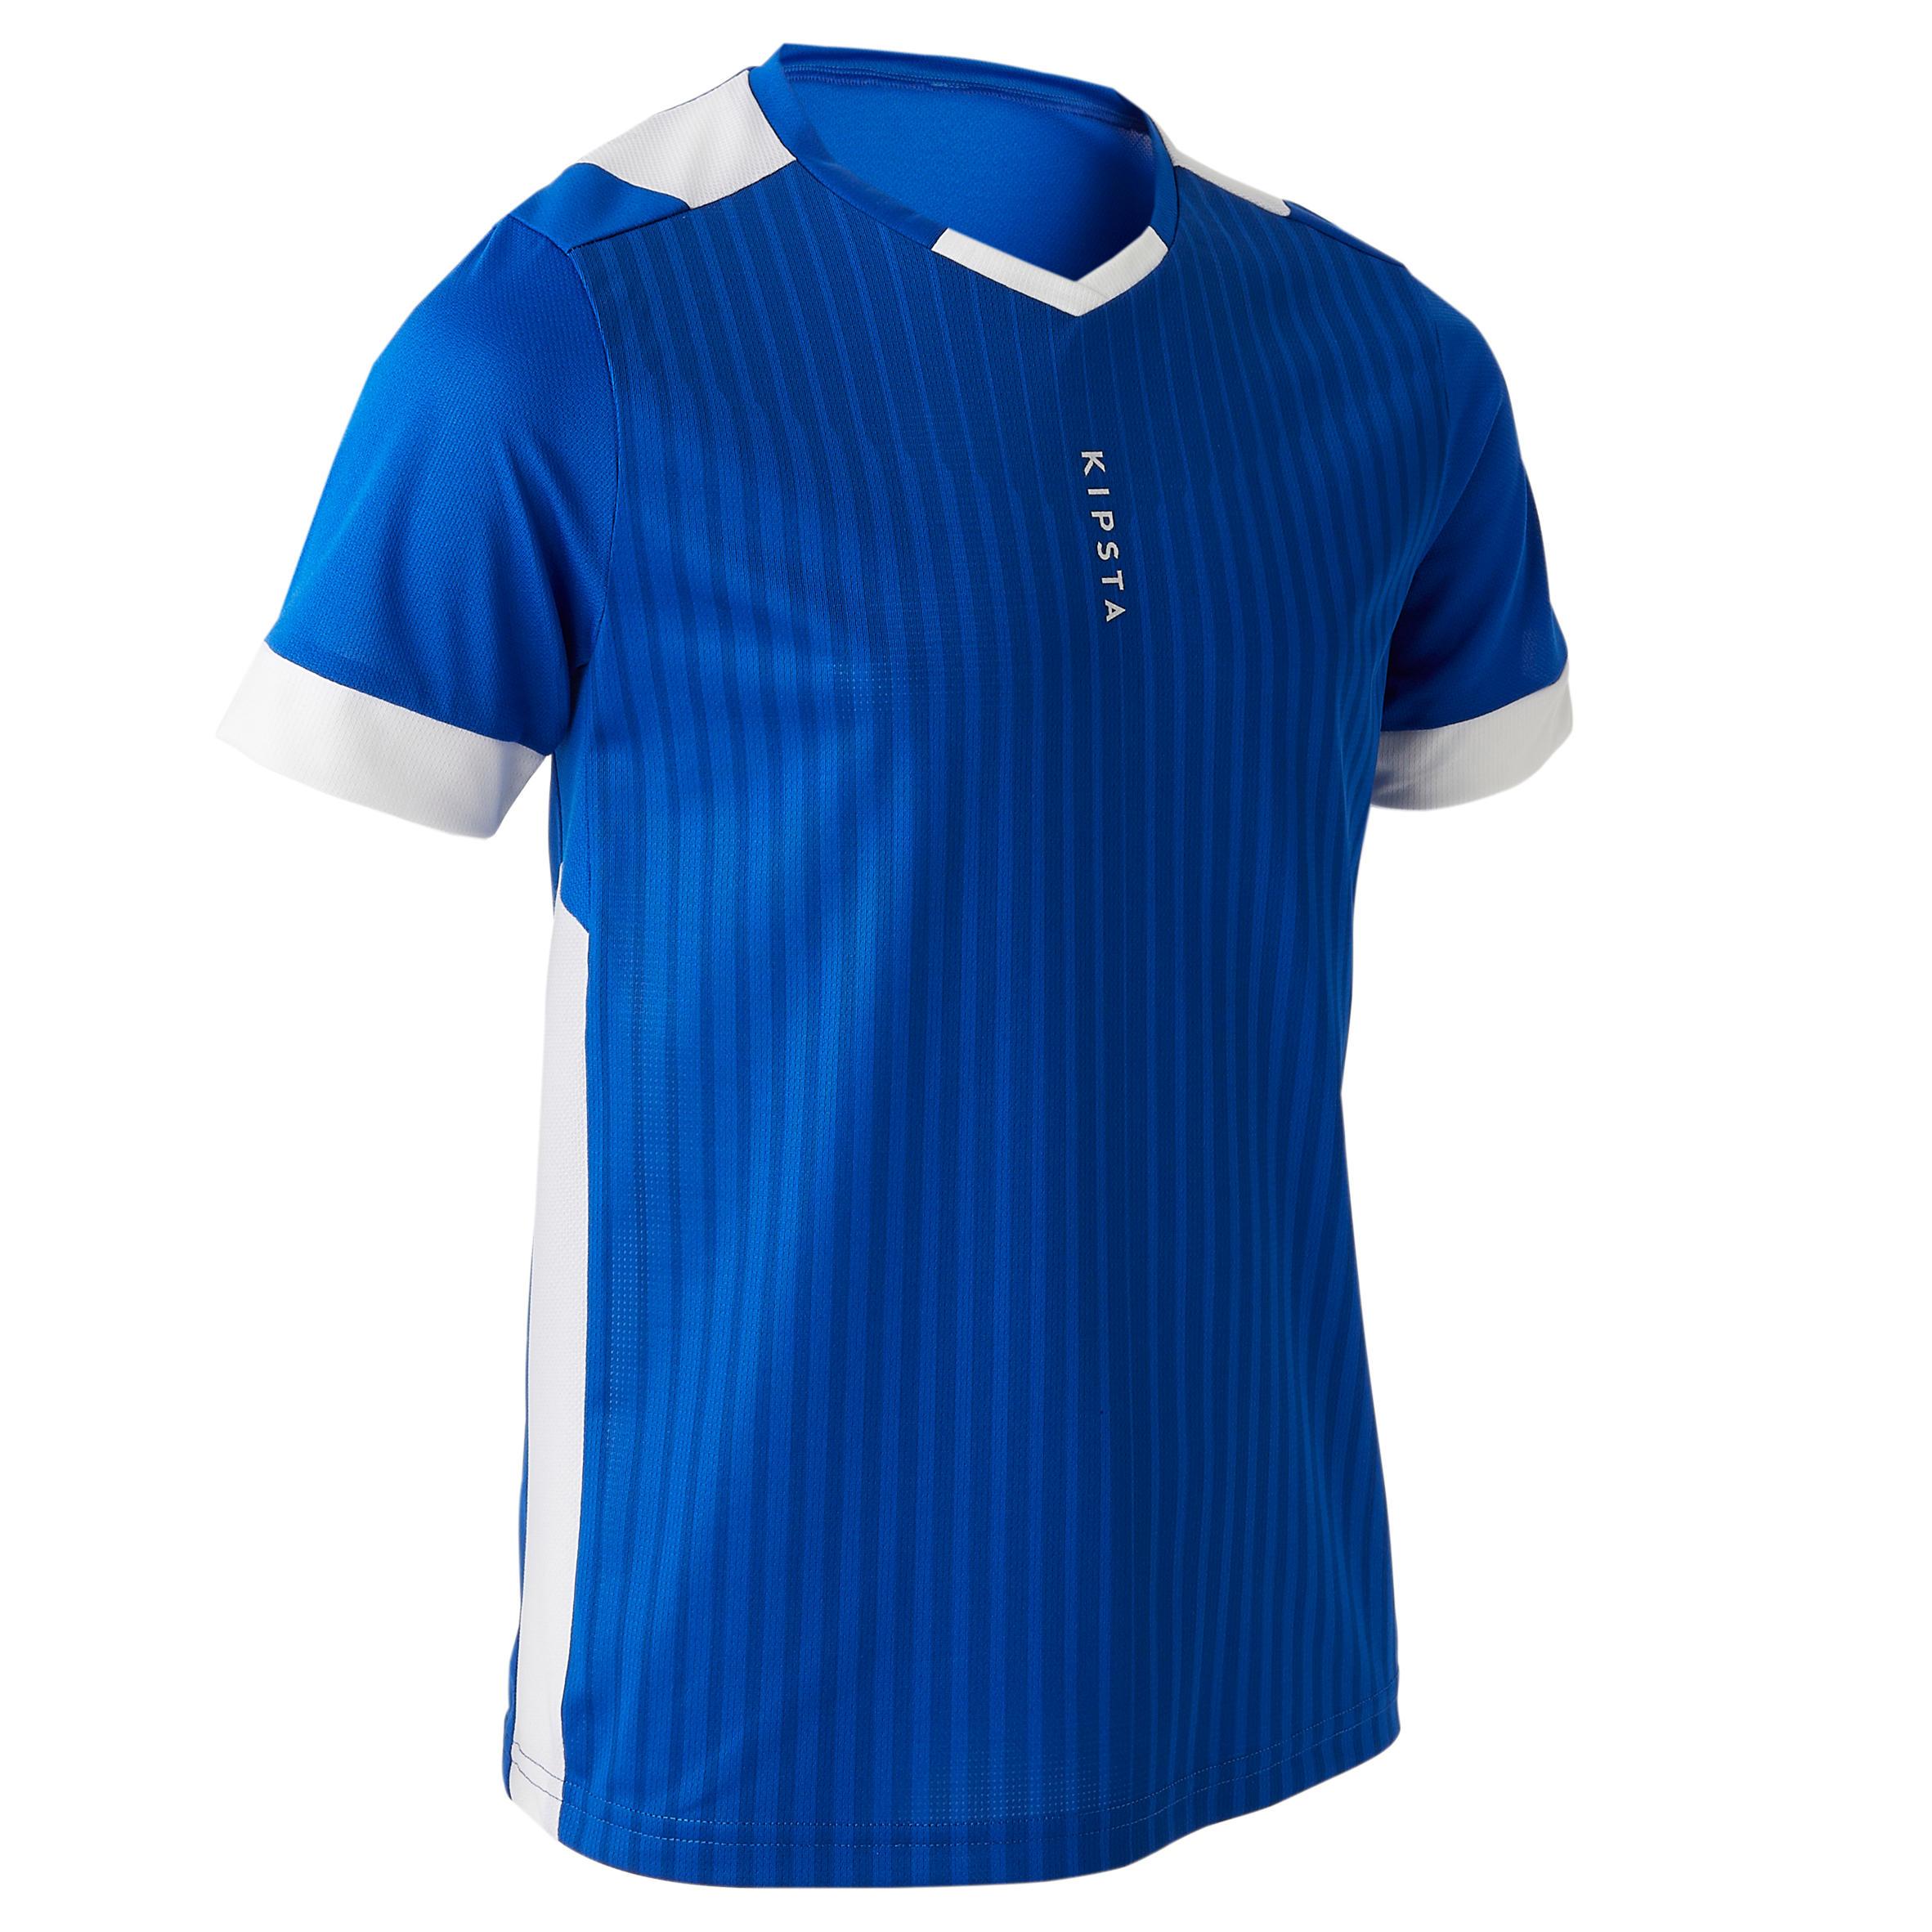 Playera de fútbol júnior manga corta F500 azul y blanco